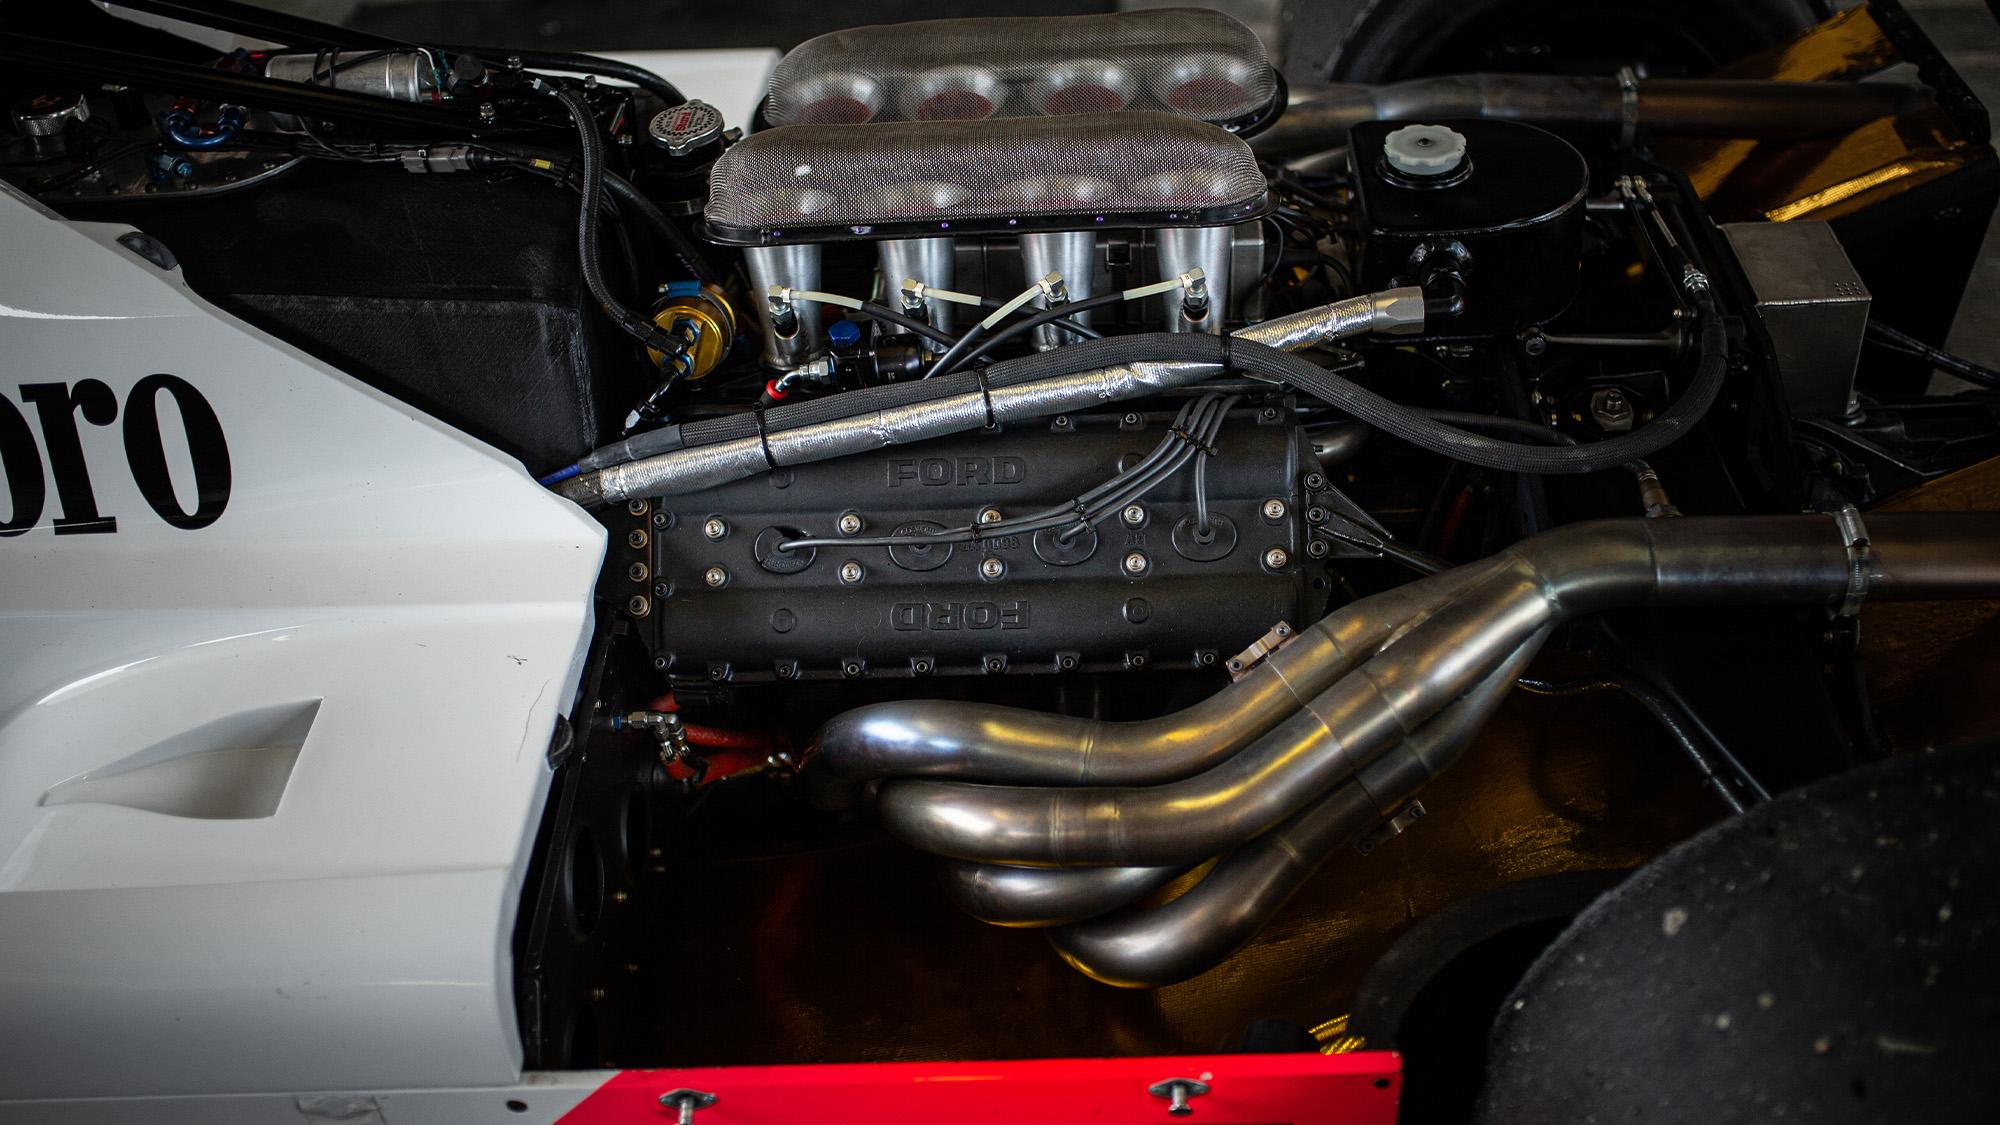 Steve Hartley McLaren MP4-1 at Brands Hatch 2021 - engine